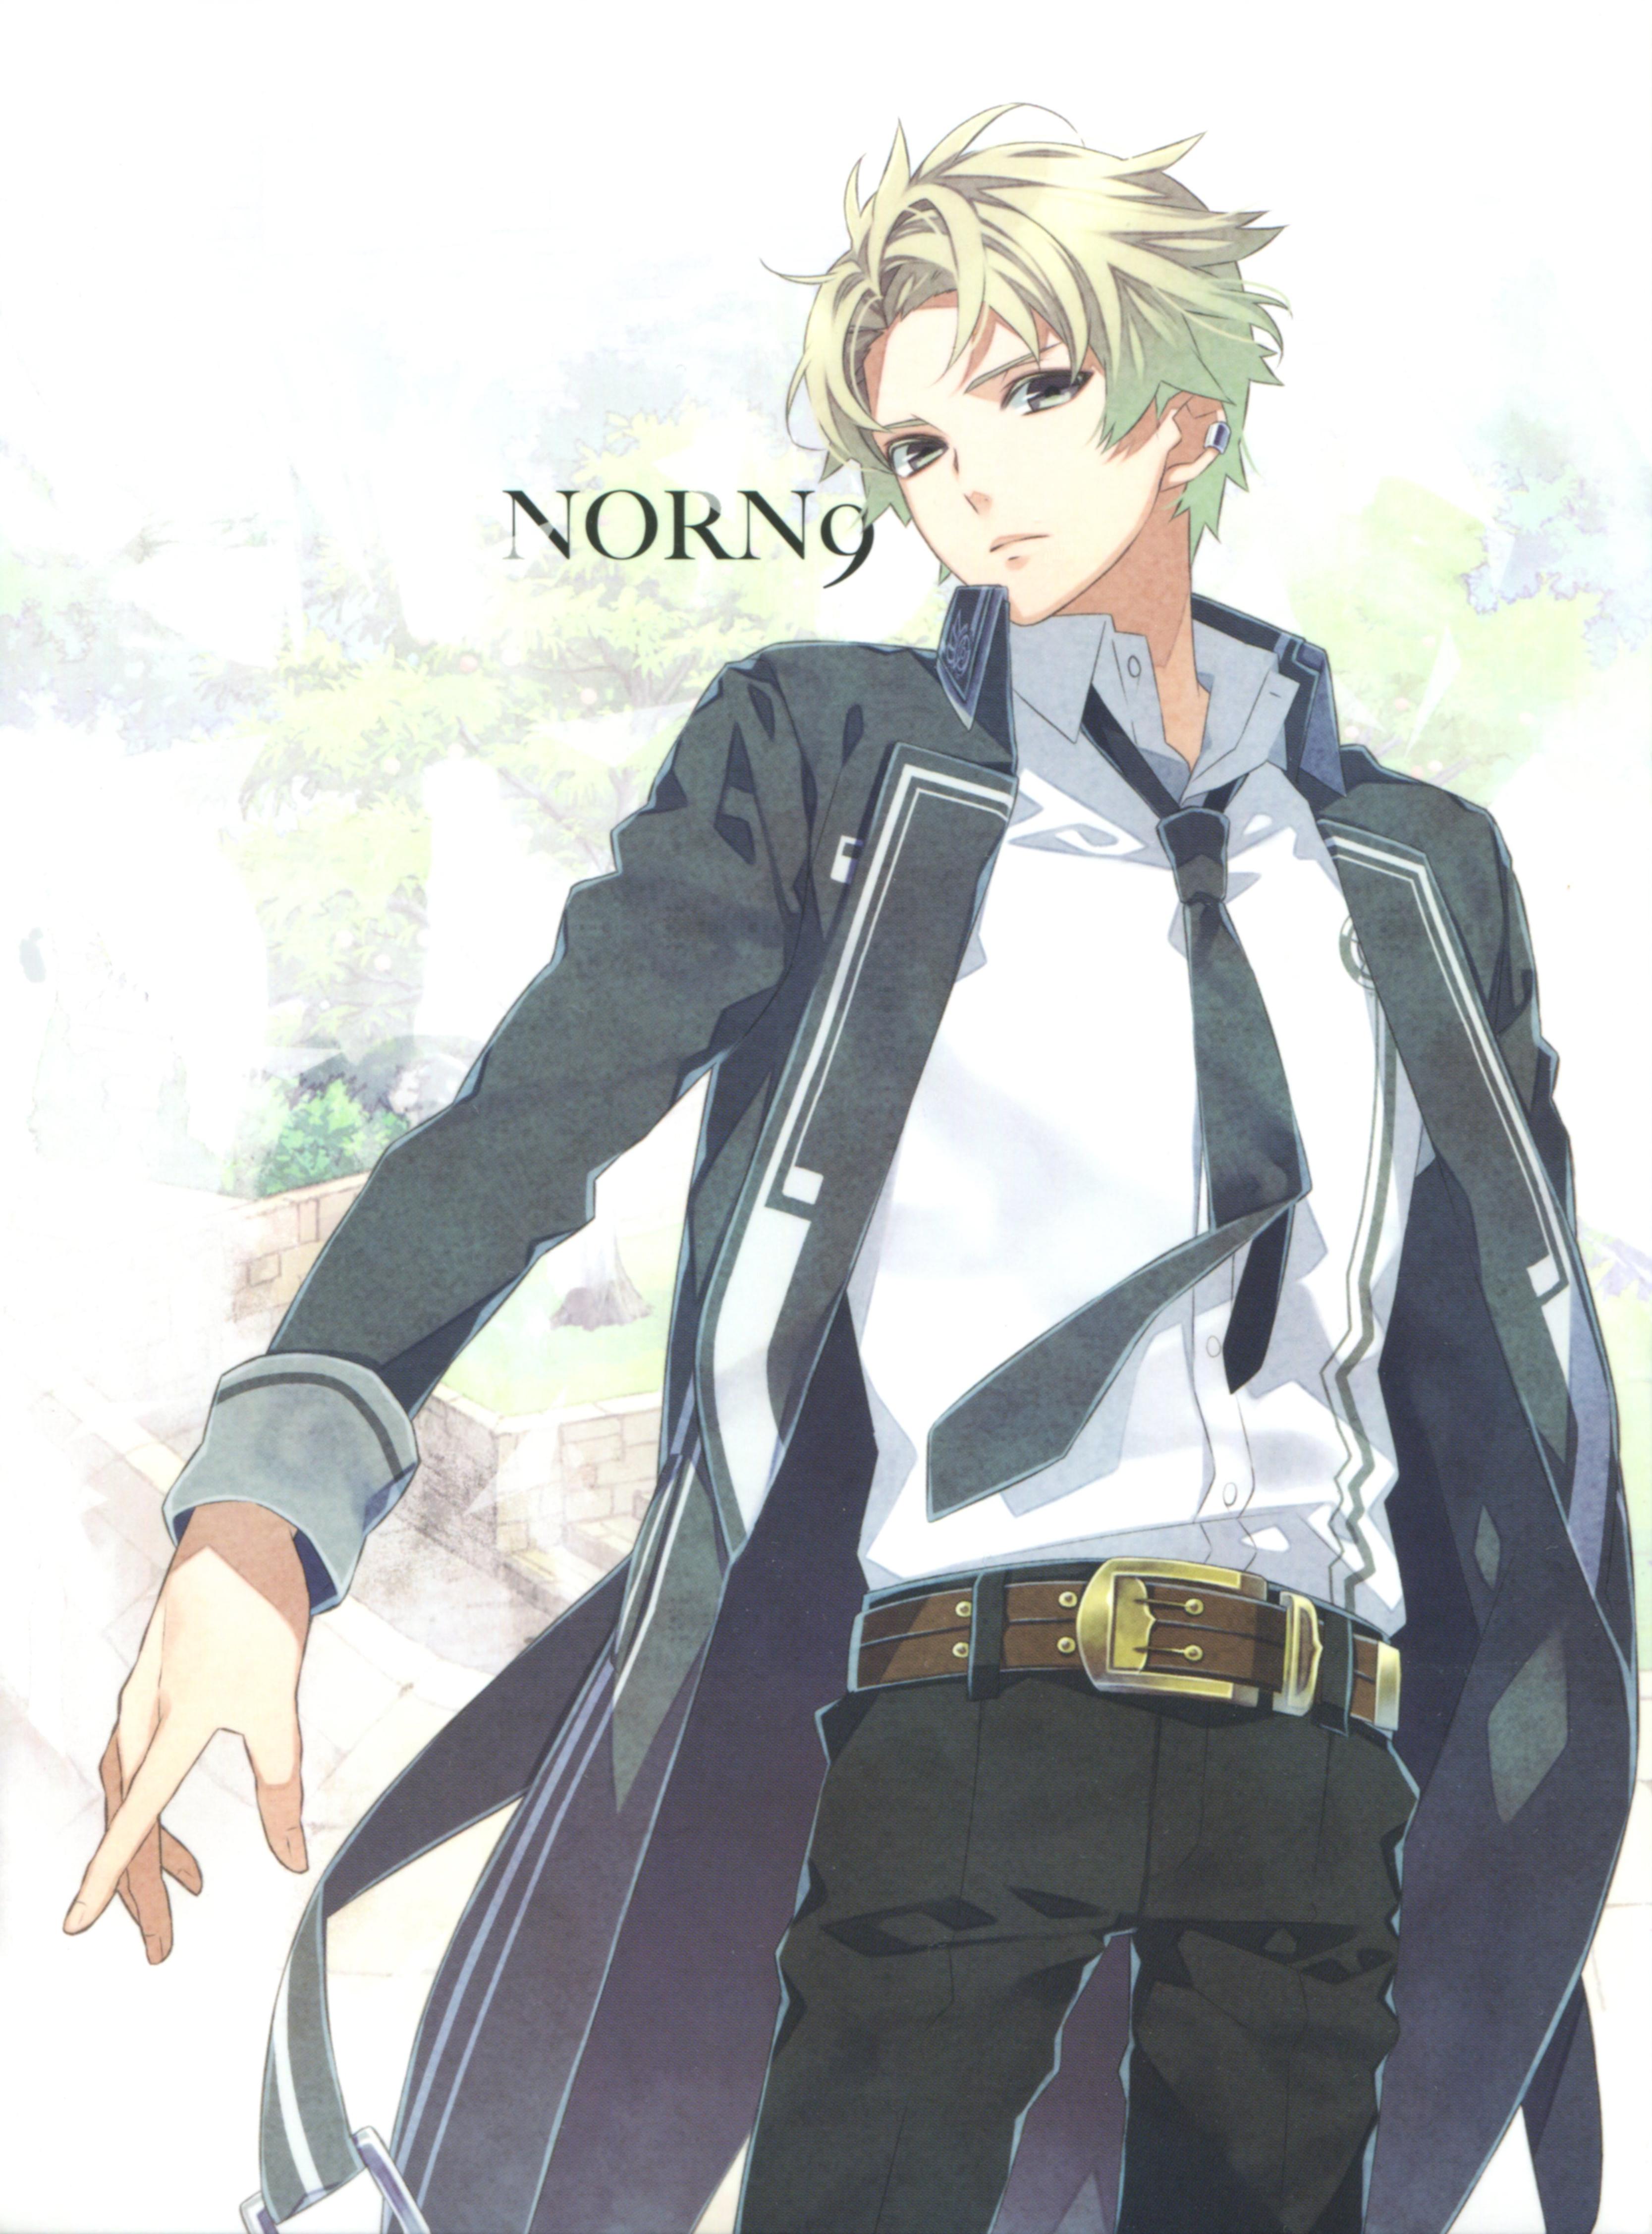 Yuiga Kakeru Norn9 Norn Nonette Image 2139156 Zerochan Anime Image Board